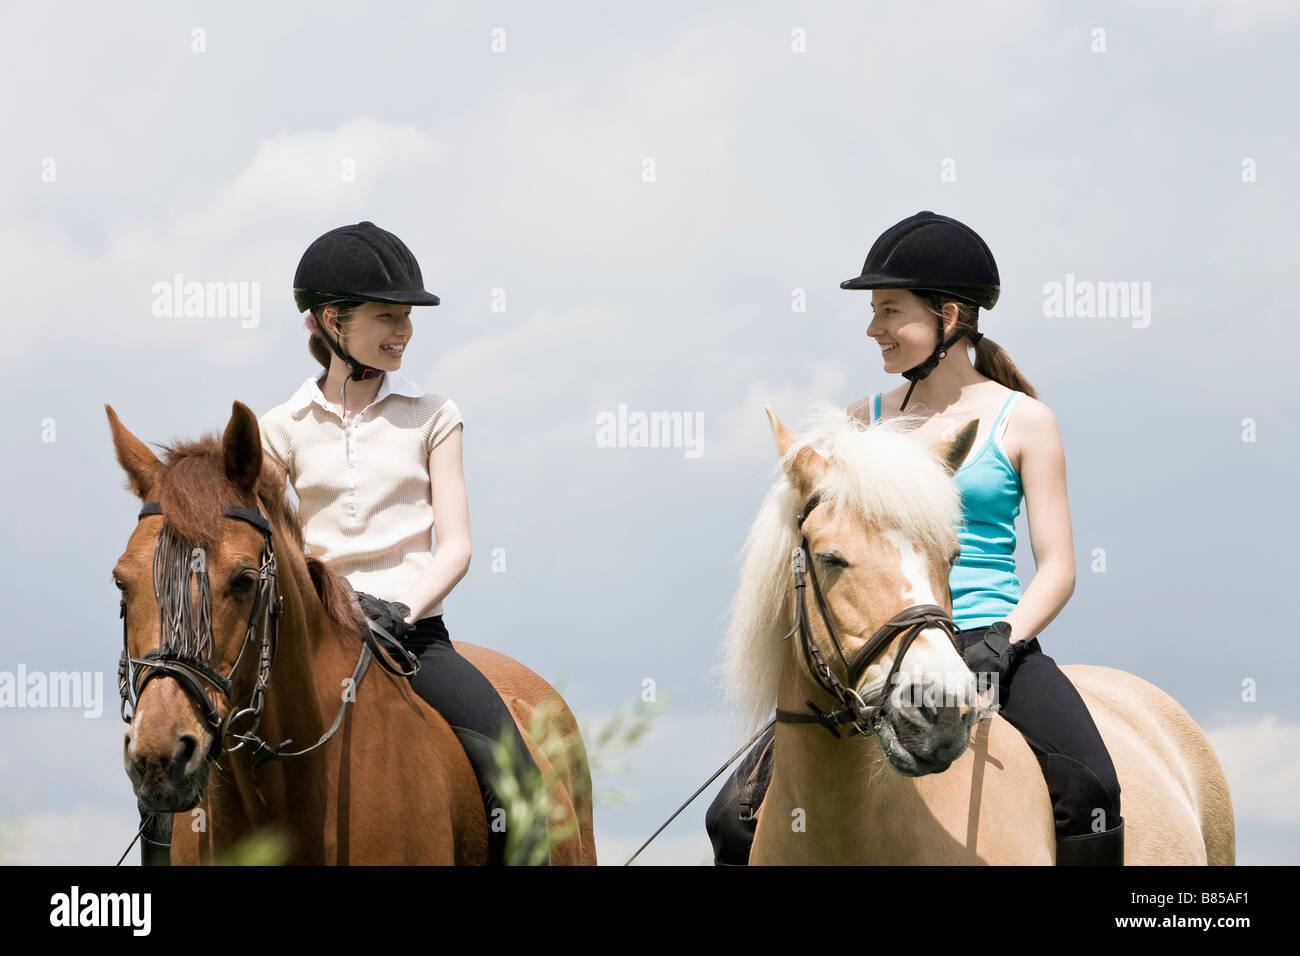 two girls doing horseback riding - Stock Image